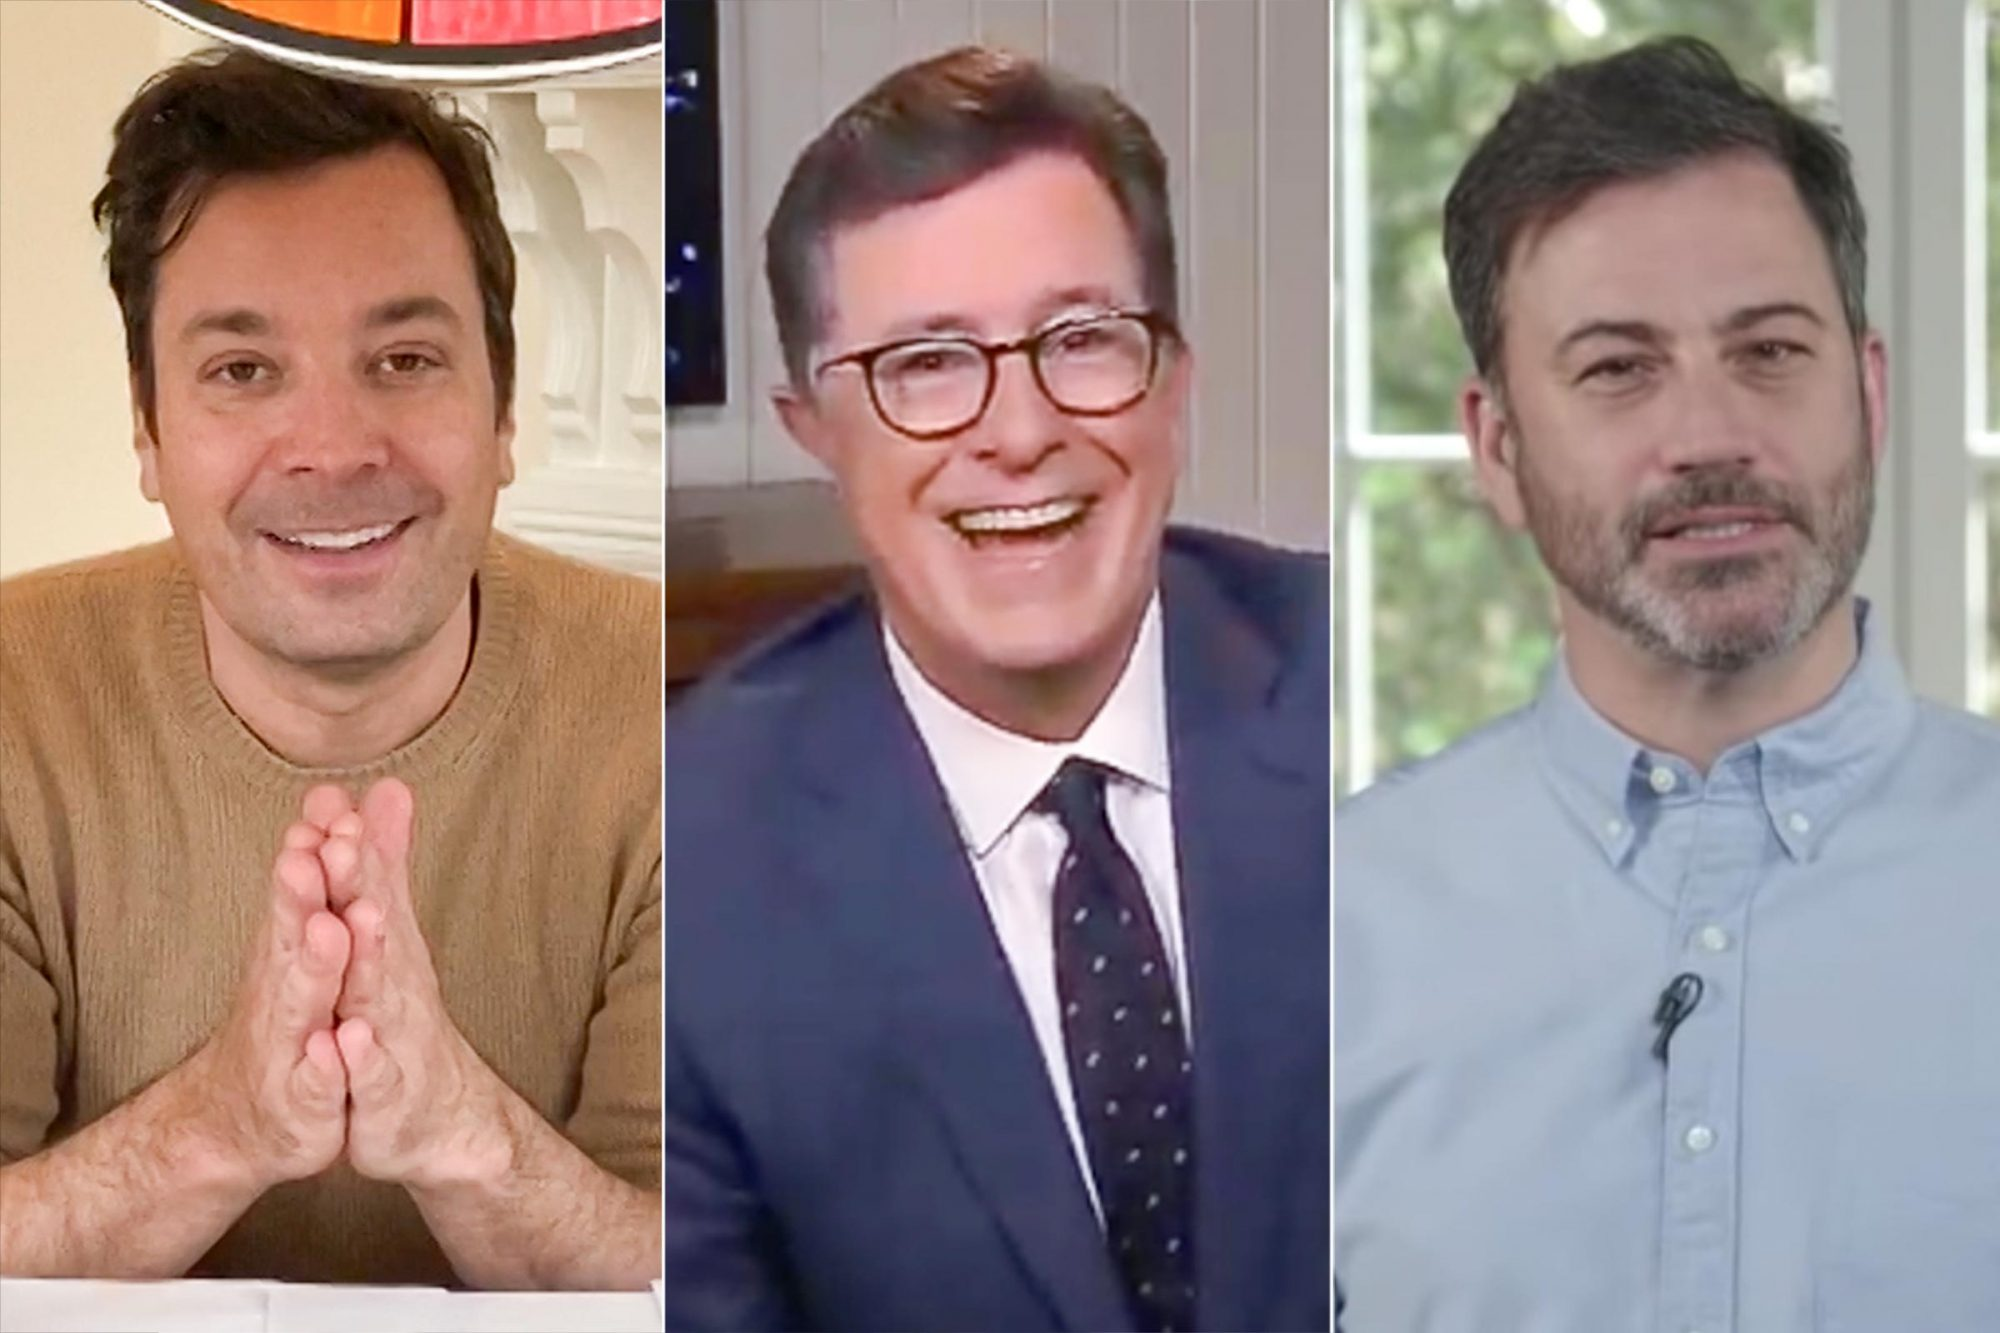 Jimmy Fallon, Stephen Colbert, and Jimmy Kimmel